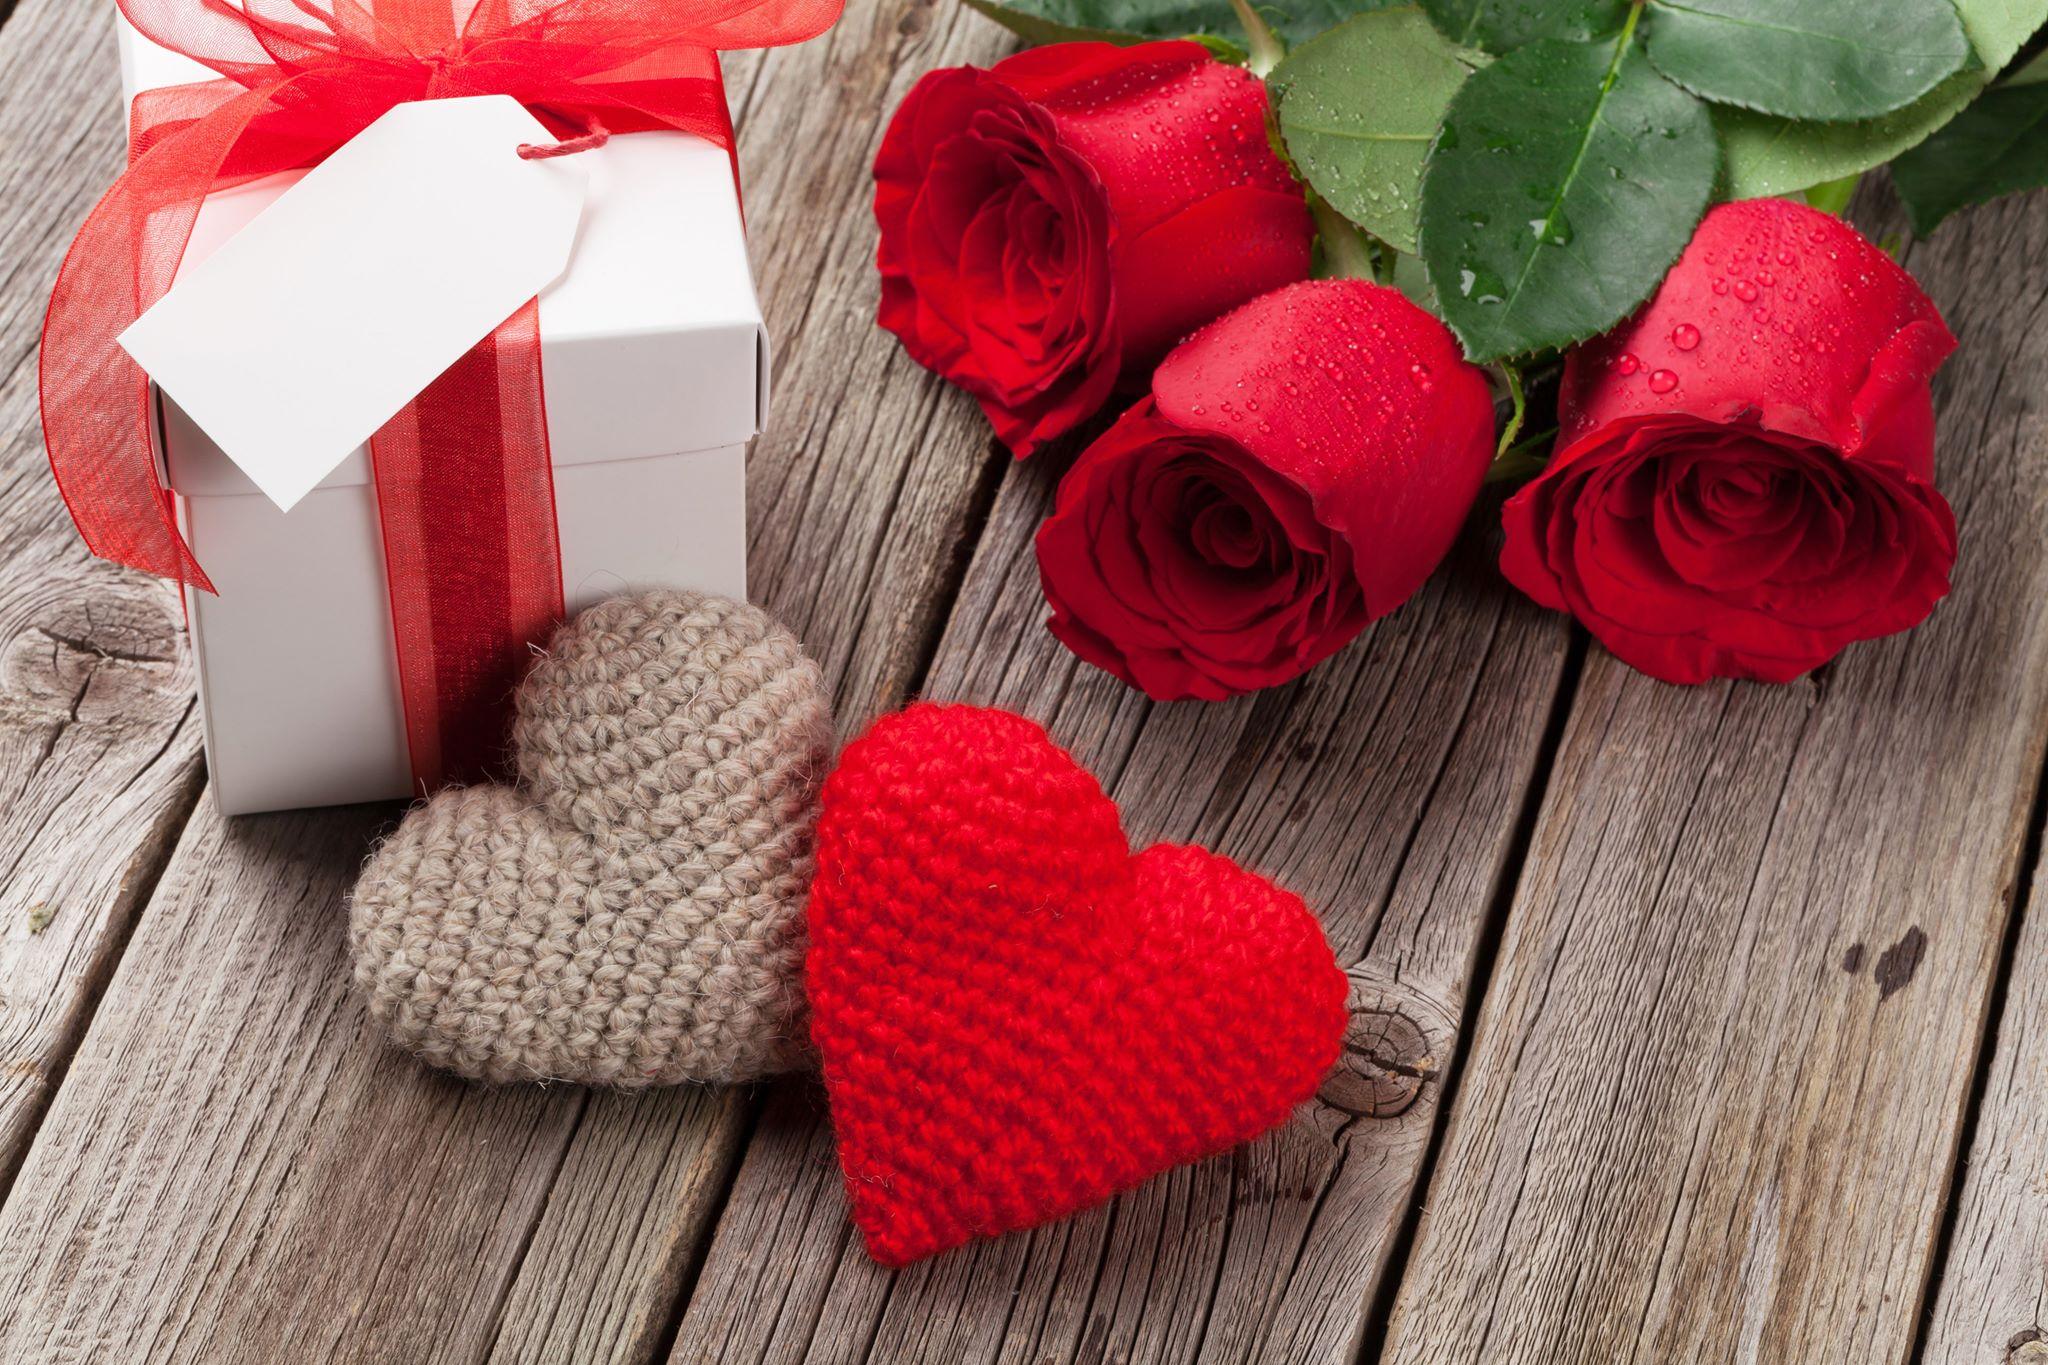 Valentines day images 5 صور عيد الحب